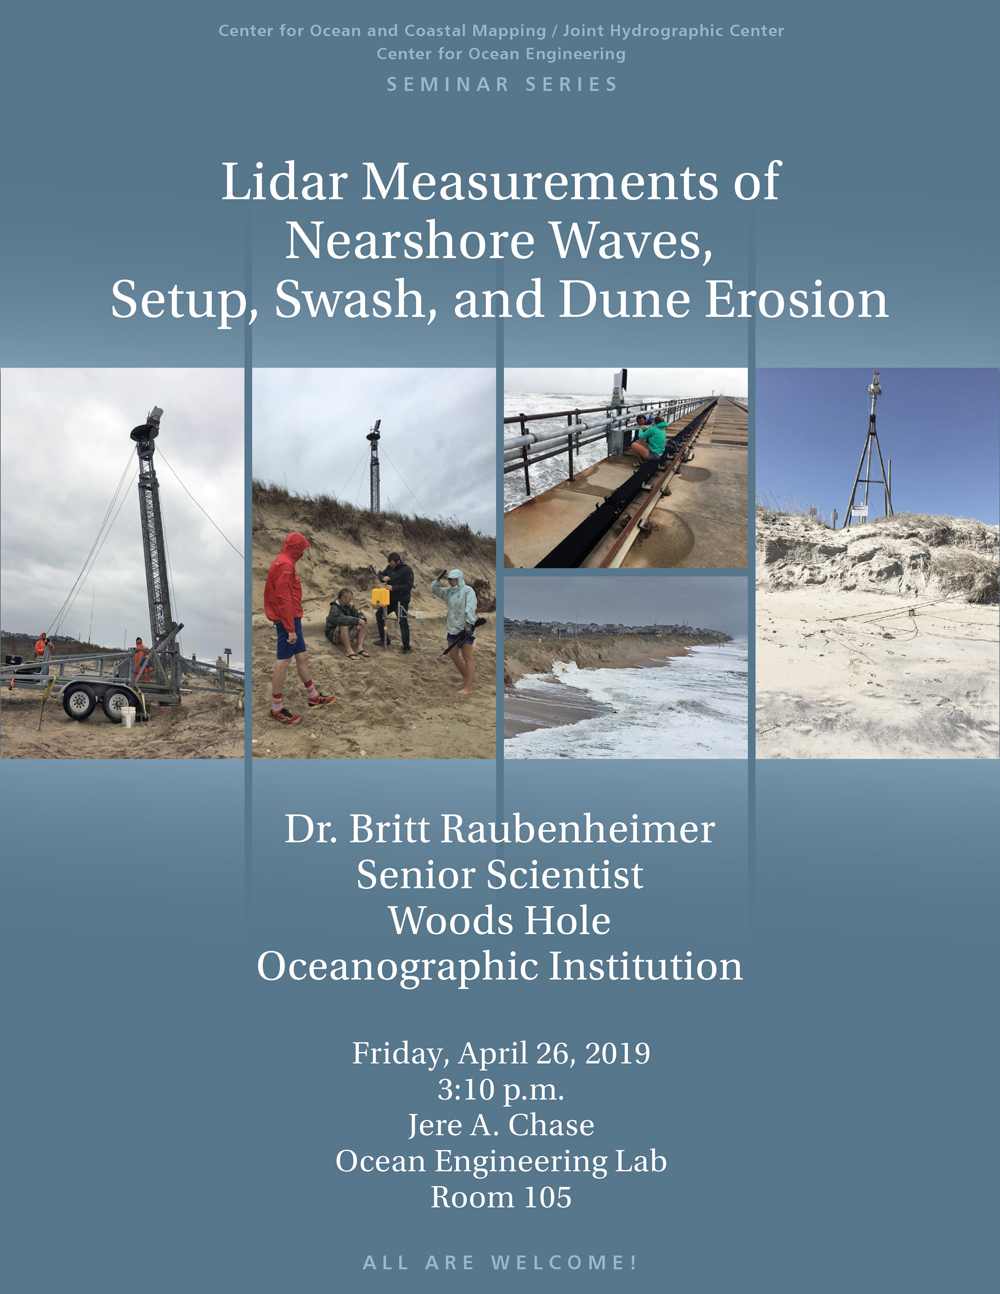 Lidar Measurements of Nearshore Waves, Setup, Swash, and